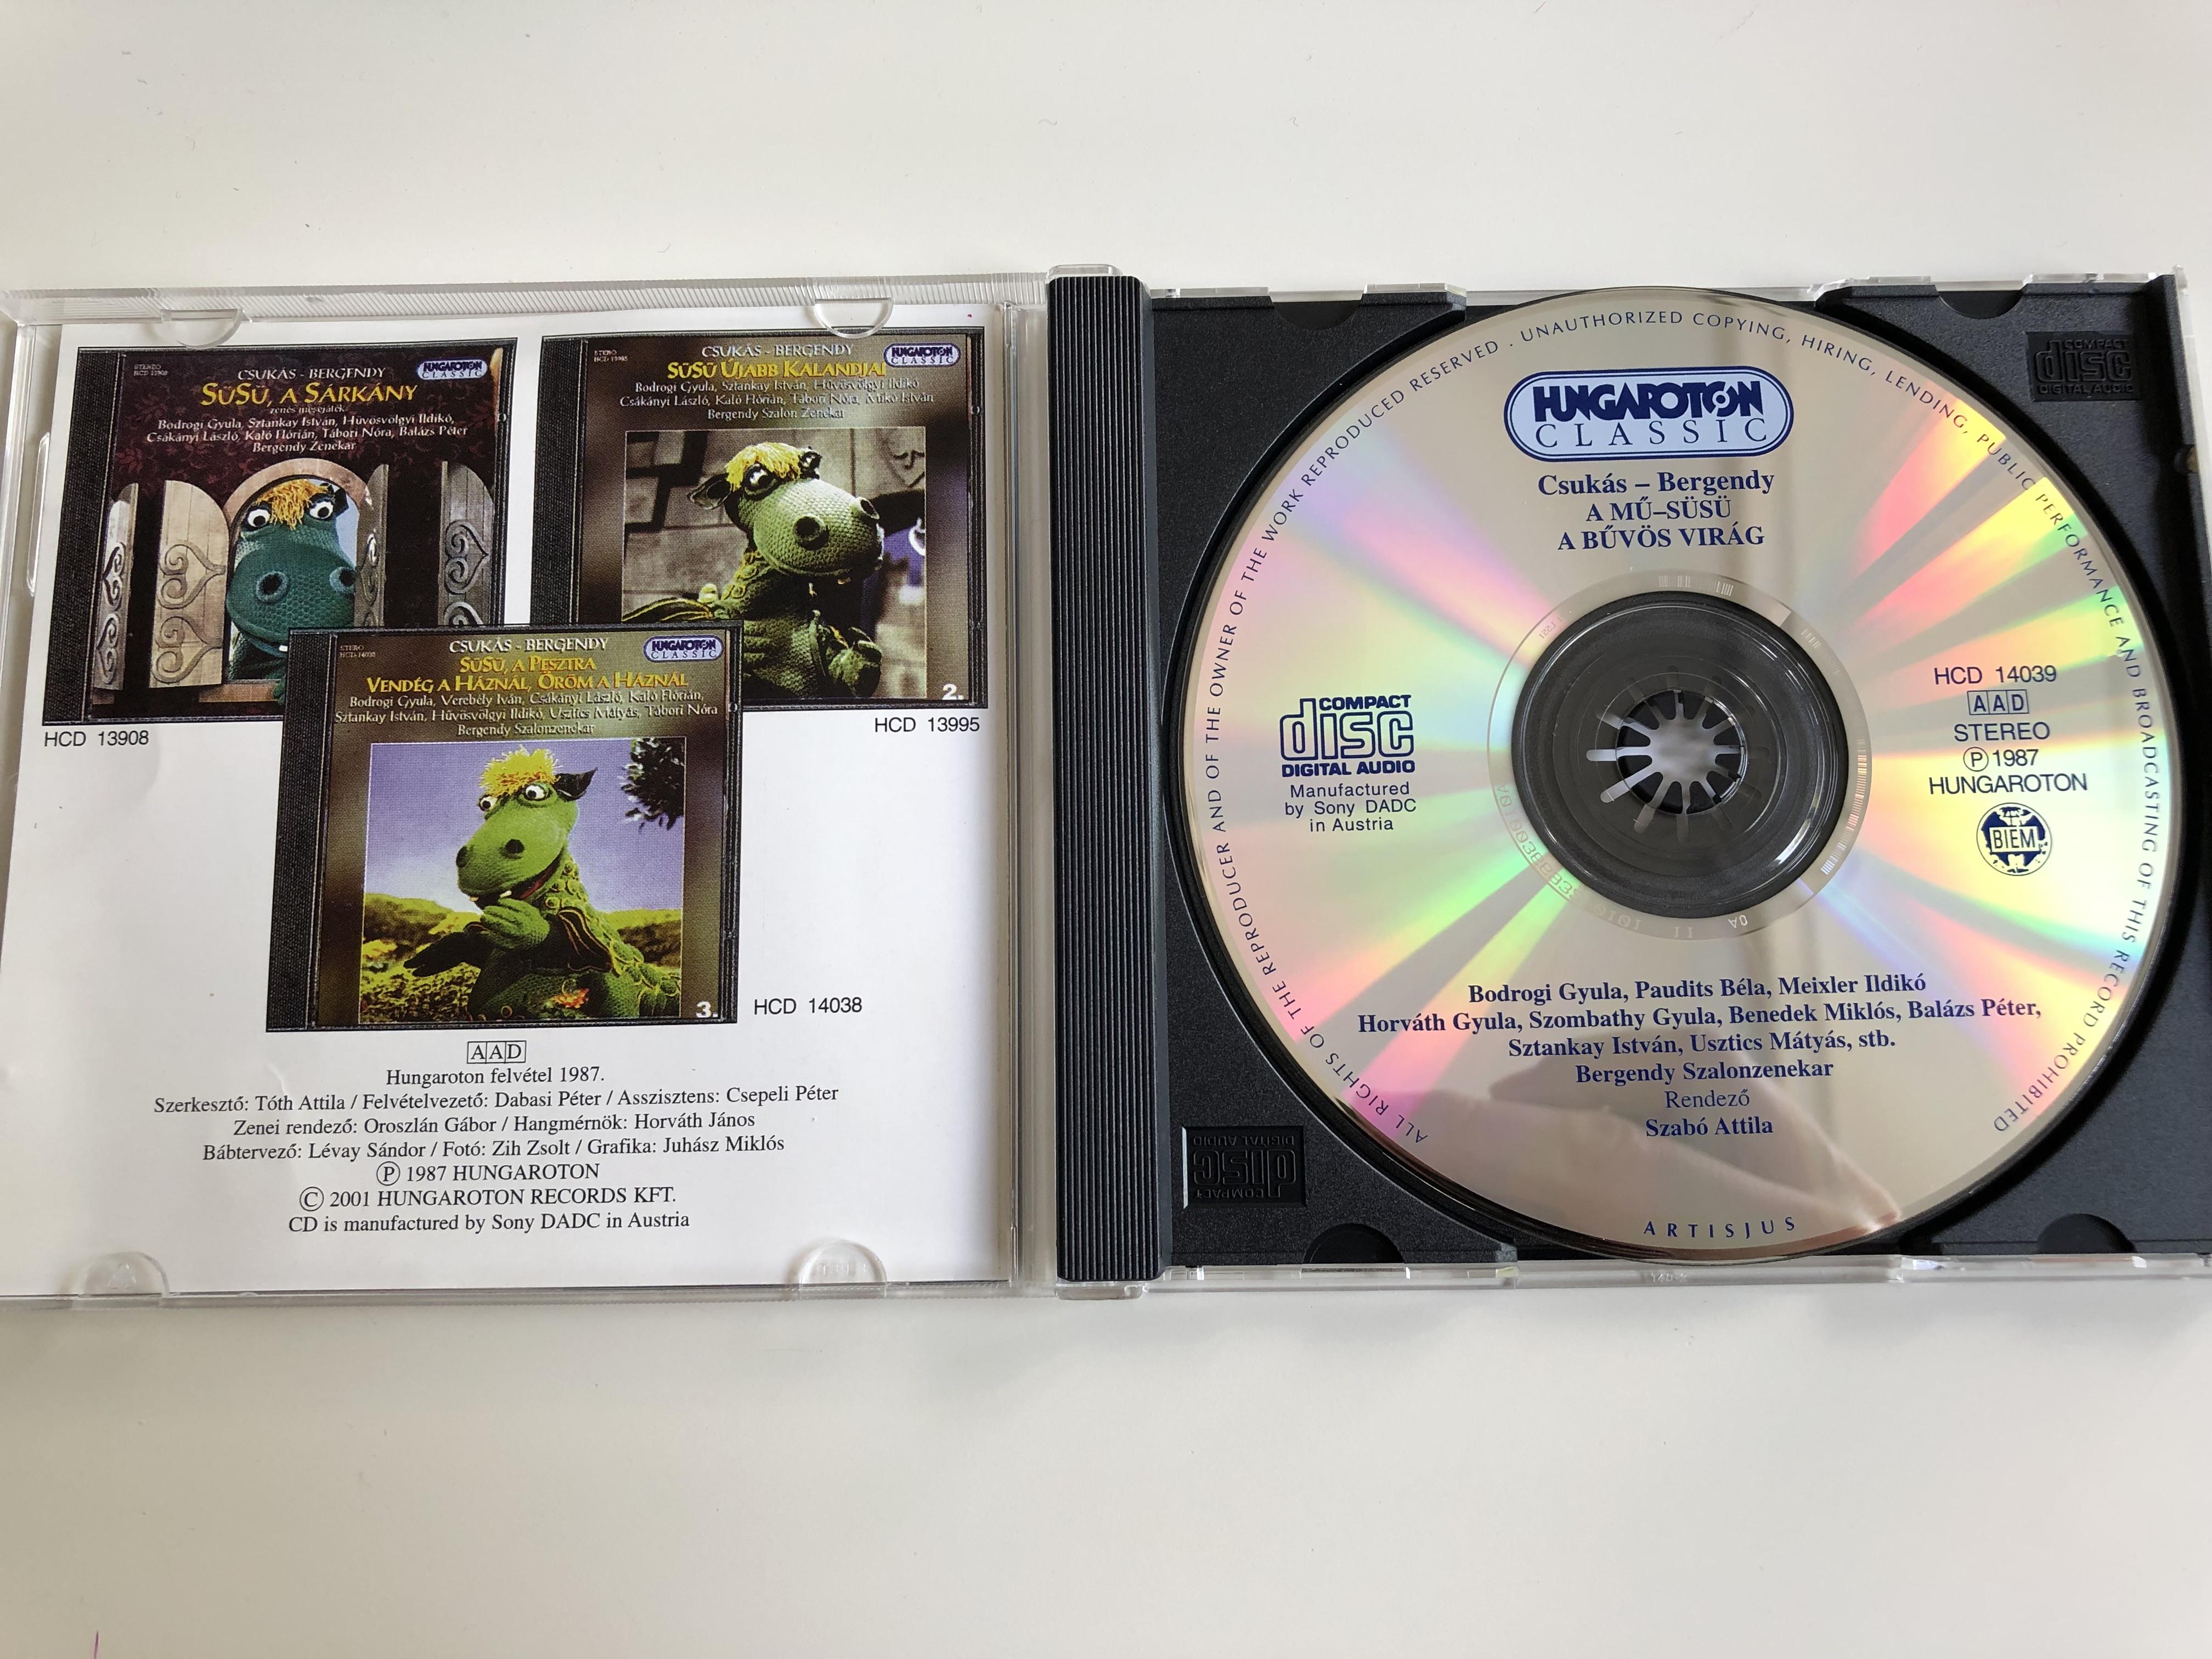 csuk-s-bergendy-a-m-s-s-a-b-v-s-vir-g-bodrogi-gyula-paudits-b-la-bal-zs-p-ter-bergendy-szalonzenekar-hungaroton-audio-cd-2001-hcd-14039-4-.jpg